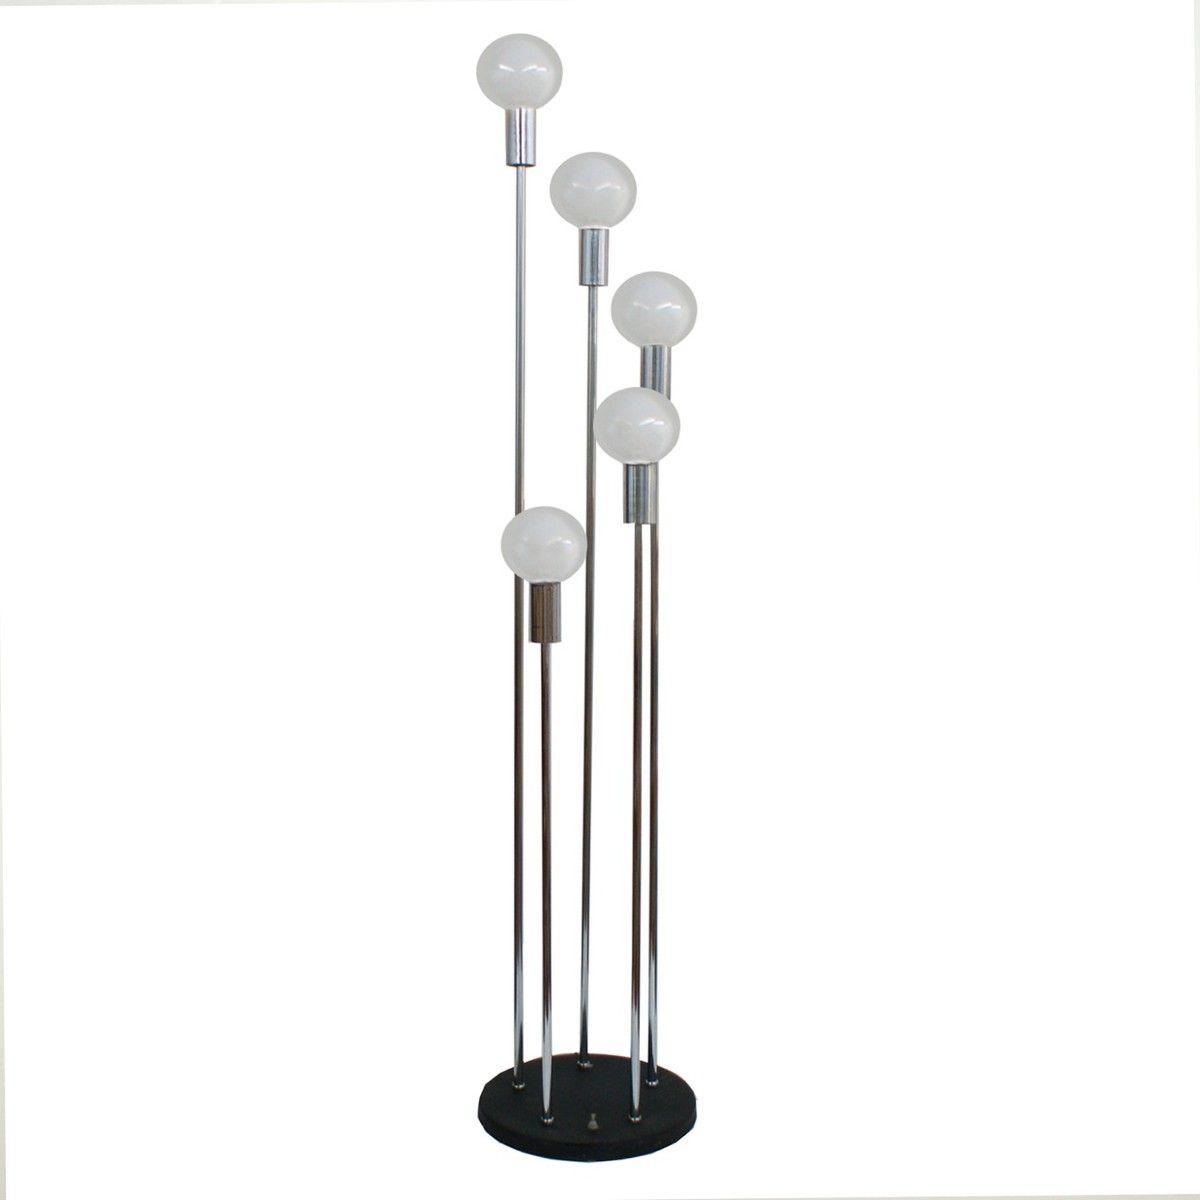 70s 5 Arm Chrome Floor Lamp Chrome Floor Lamps Floor Lamp Lamp